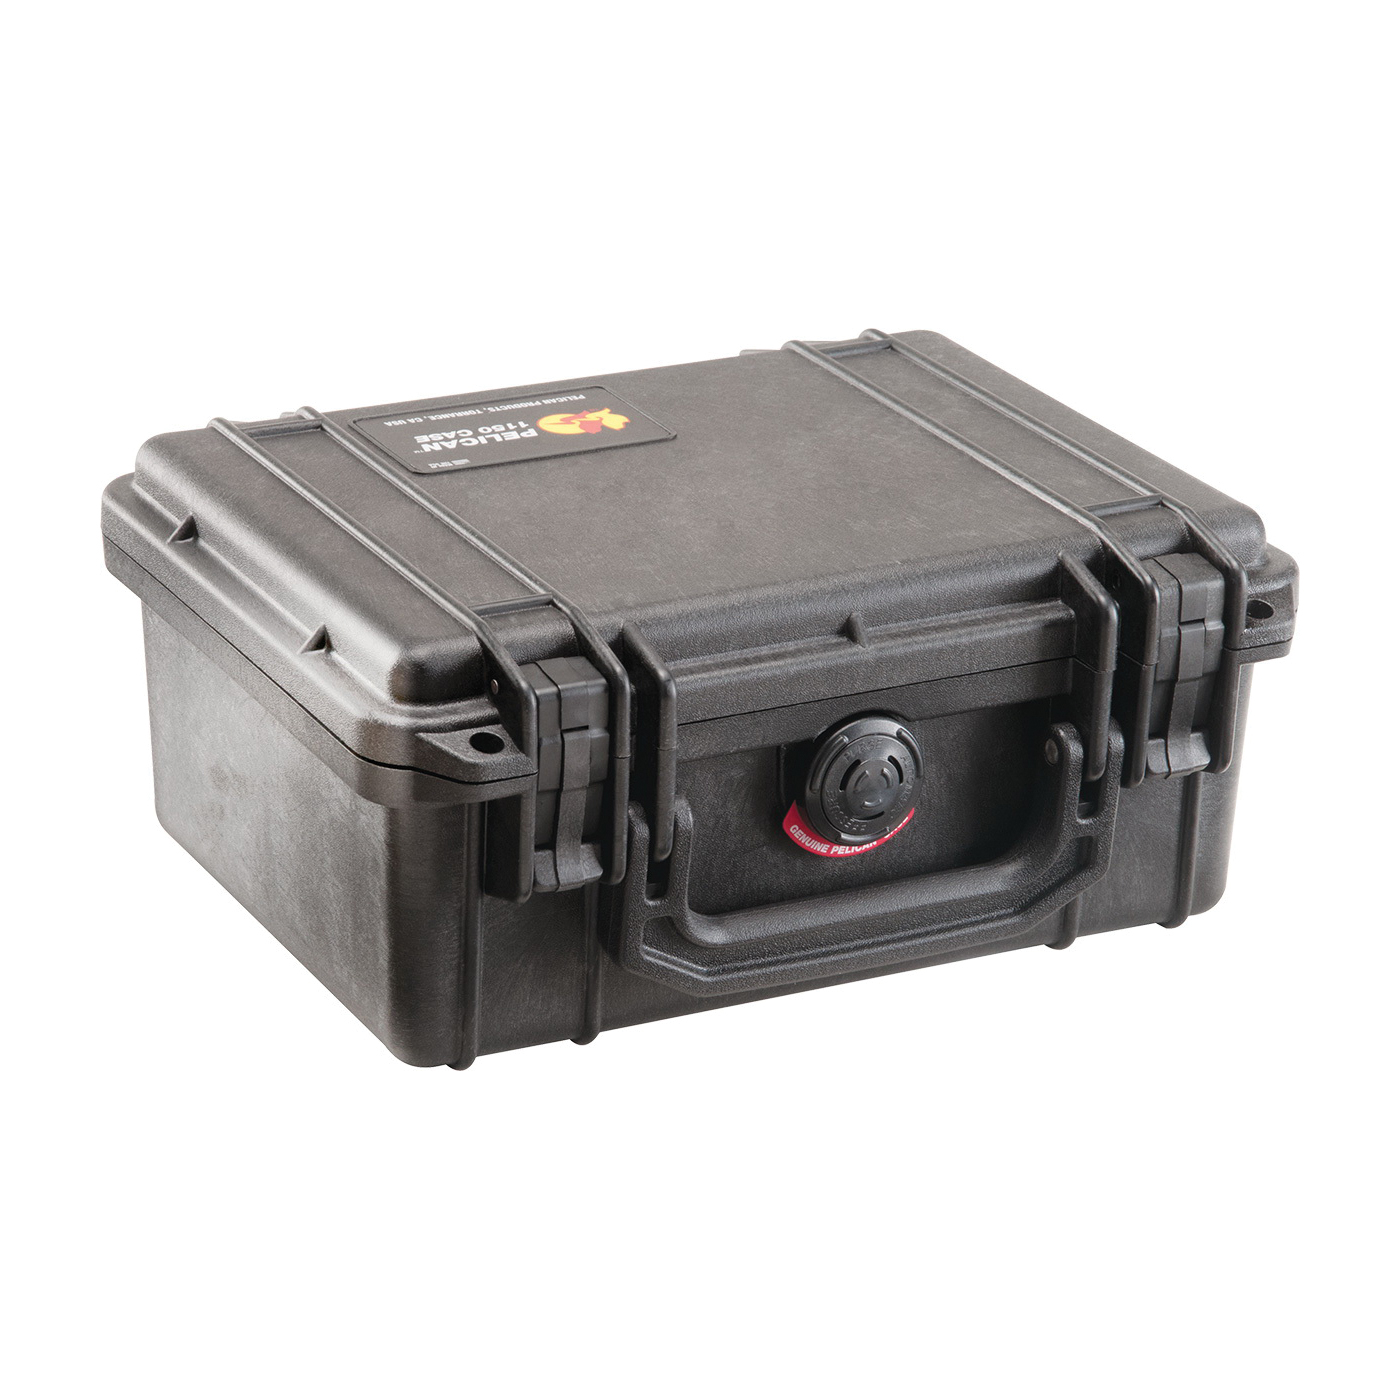 Pelican™ PROTECTOR CASE™ 1120-000-150 Small Protective Case With Lid Liner and Foam, 7.46 in L x 4.96 in W x 3.33 in H, 0.01 cu-ft, Polypropylene